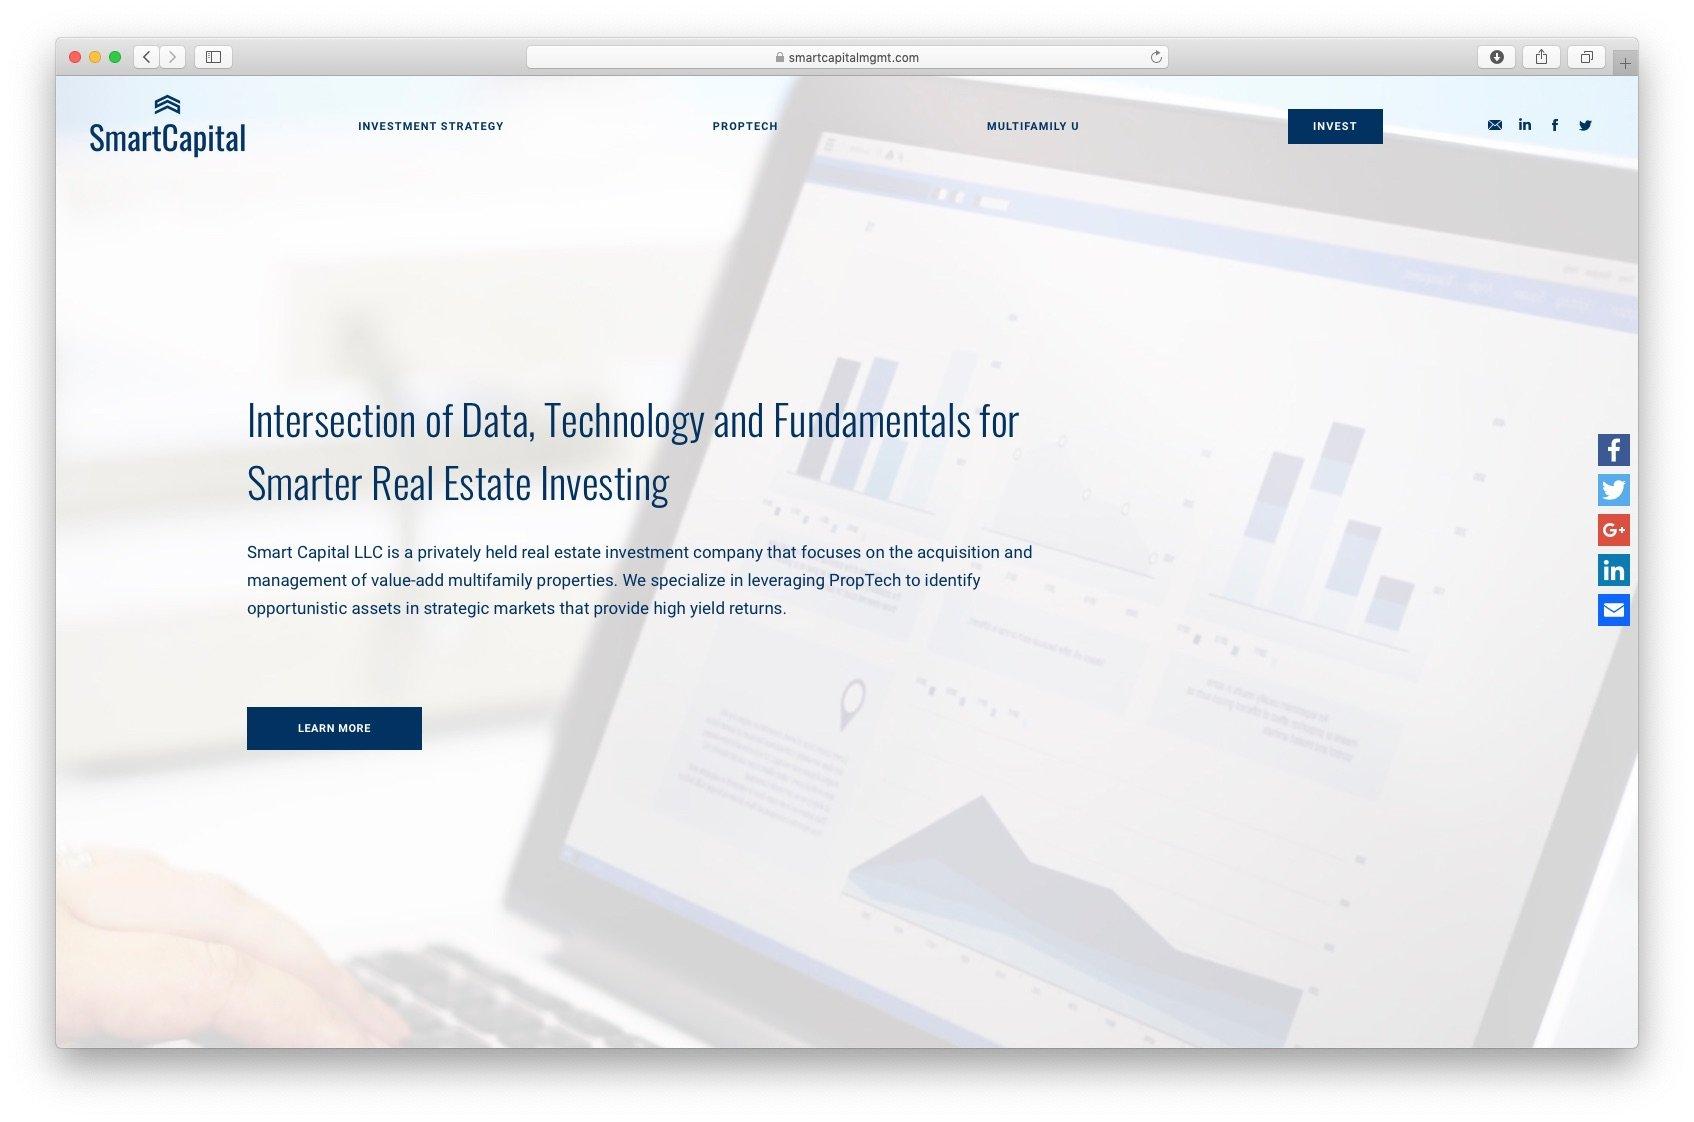 Smart Capital Web Design Whitelam Media